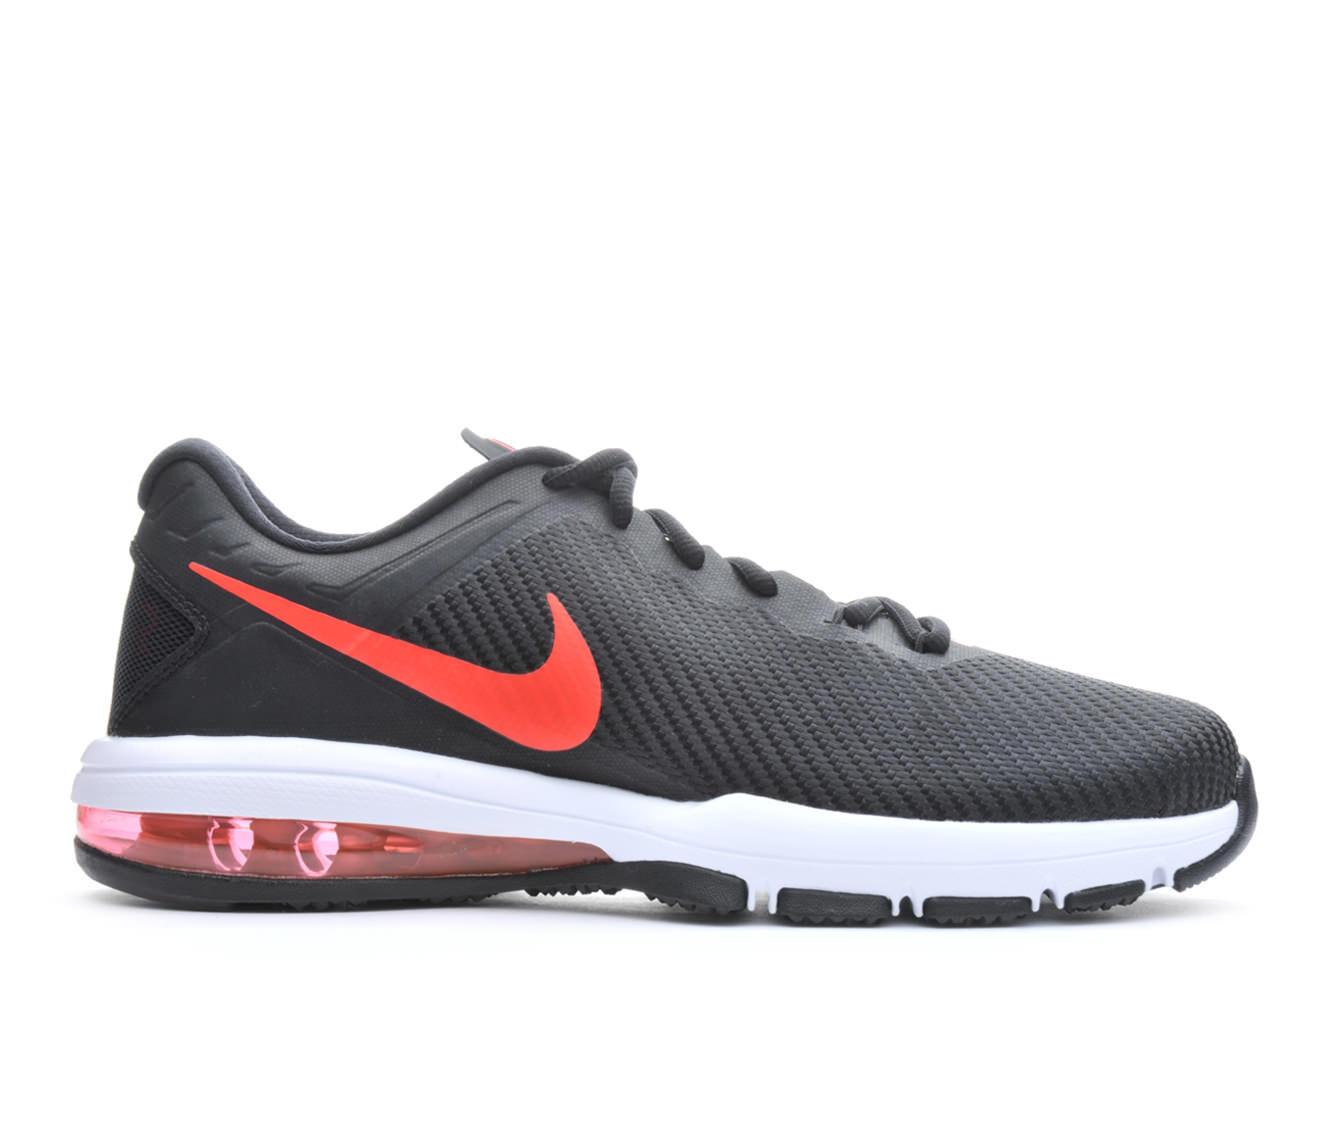 9f408ed1e099 ... clearance mens nike air max full ride tr 1.5 training shoes shoe  carnival d9d16 31280